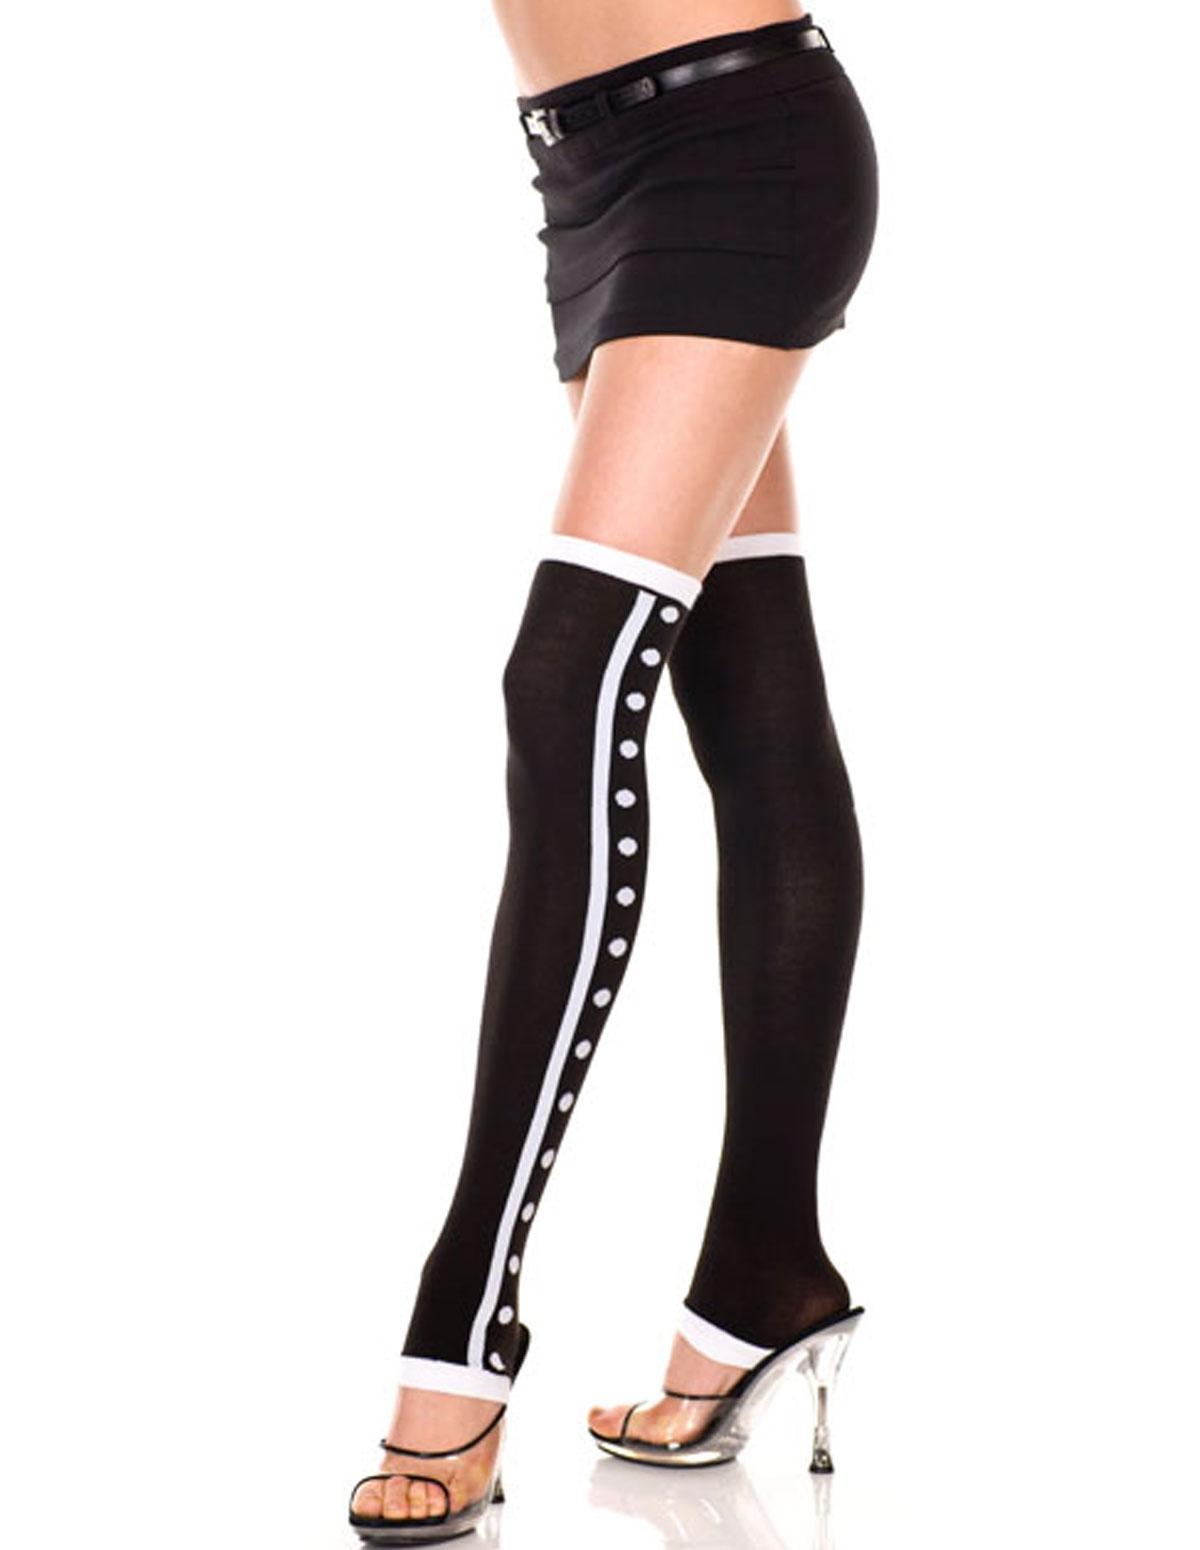 Polka Dot Stripe Acrylic Leg Warmers